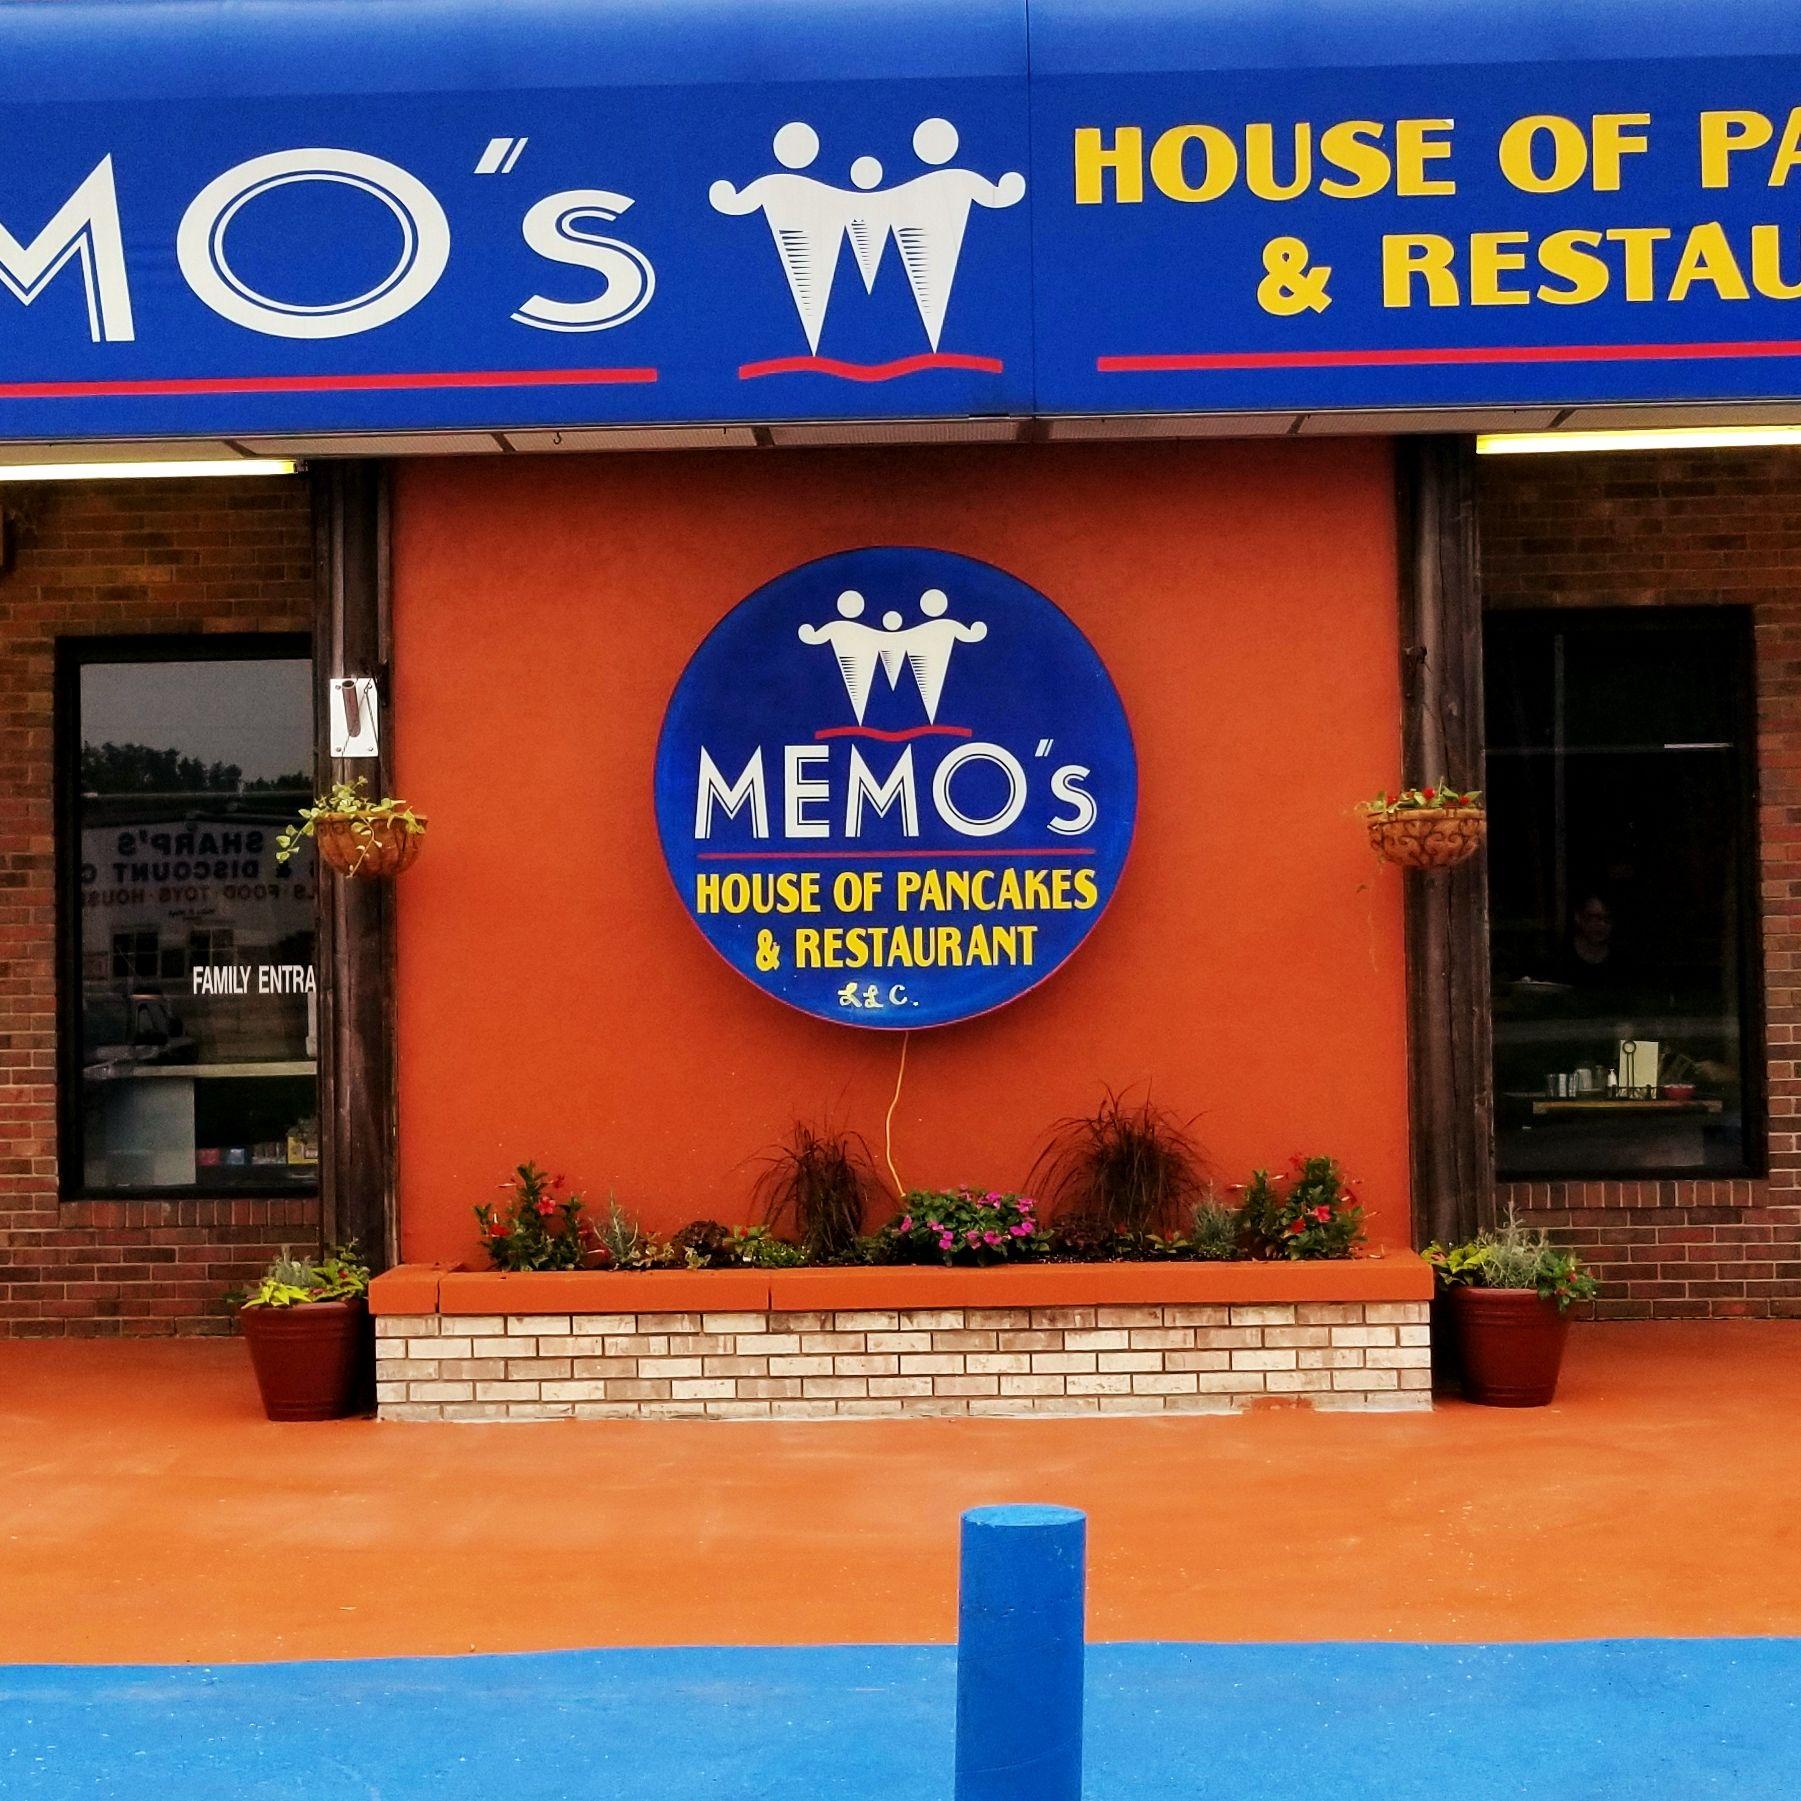 Memo's House Of Pancakes LLC